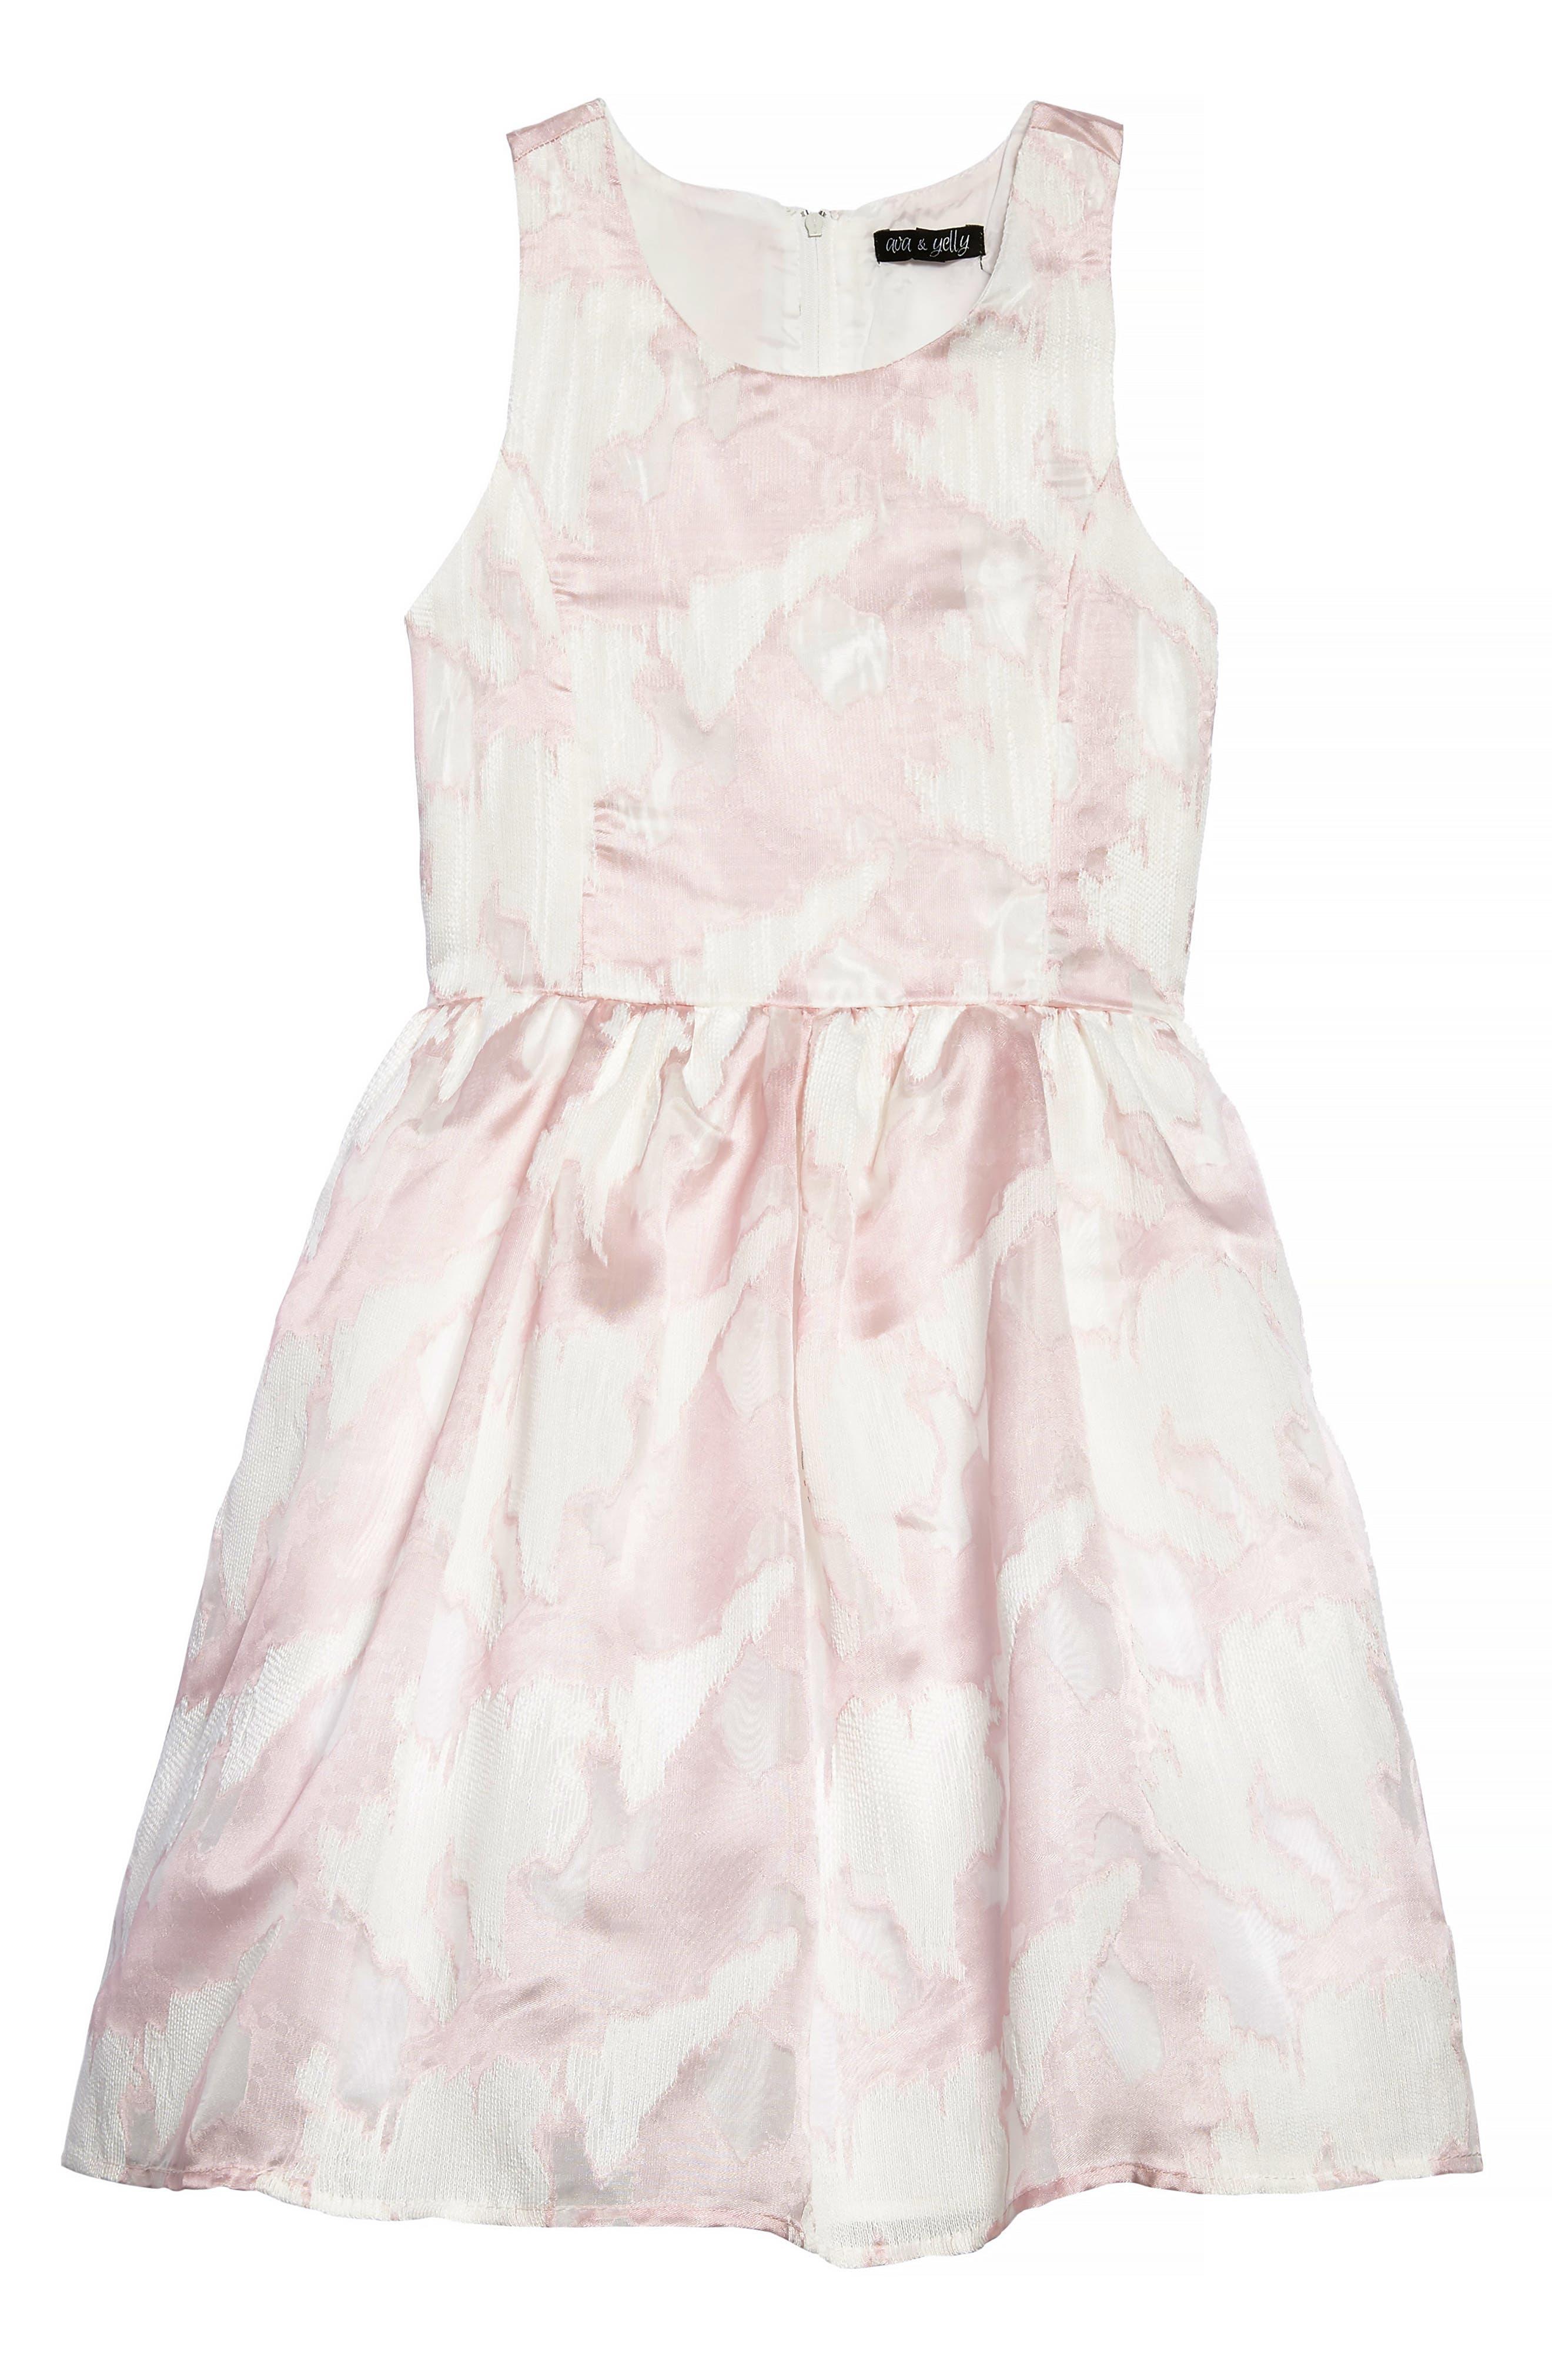 Chiffon Party Dress,                             Main thumbnail 1, color,                             Pink/ White